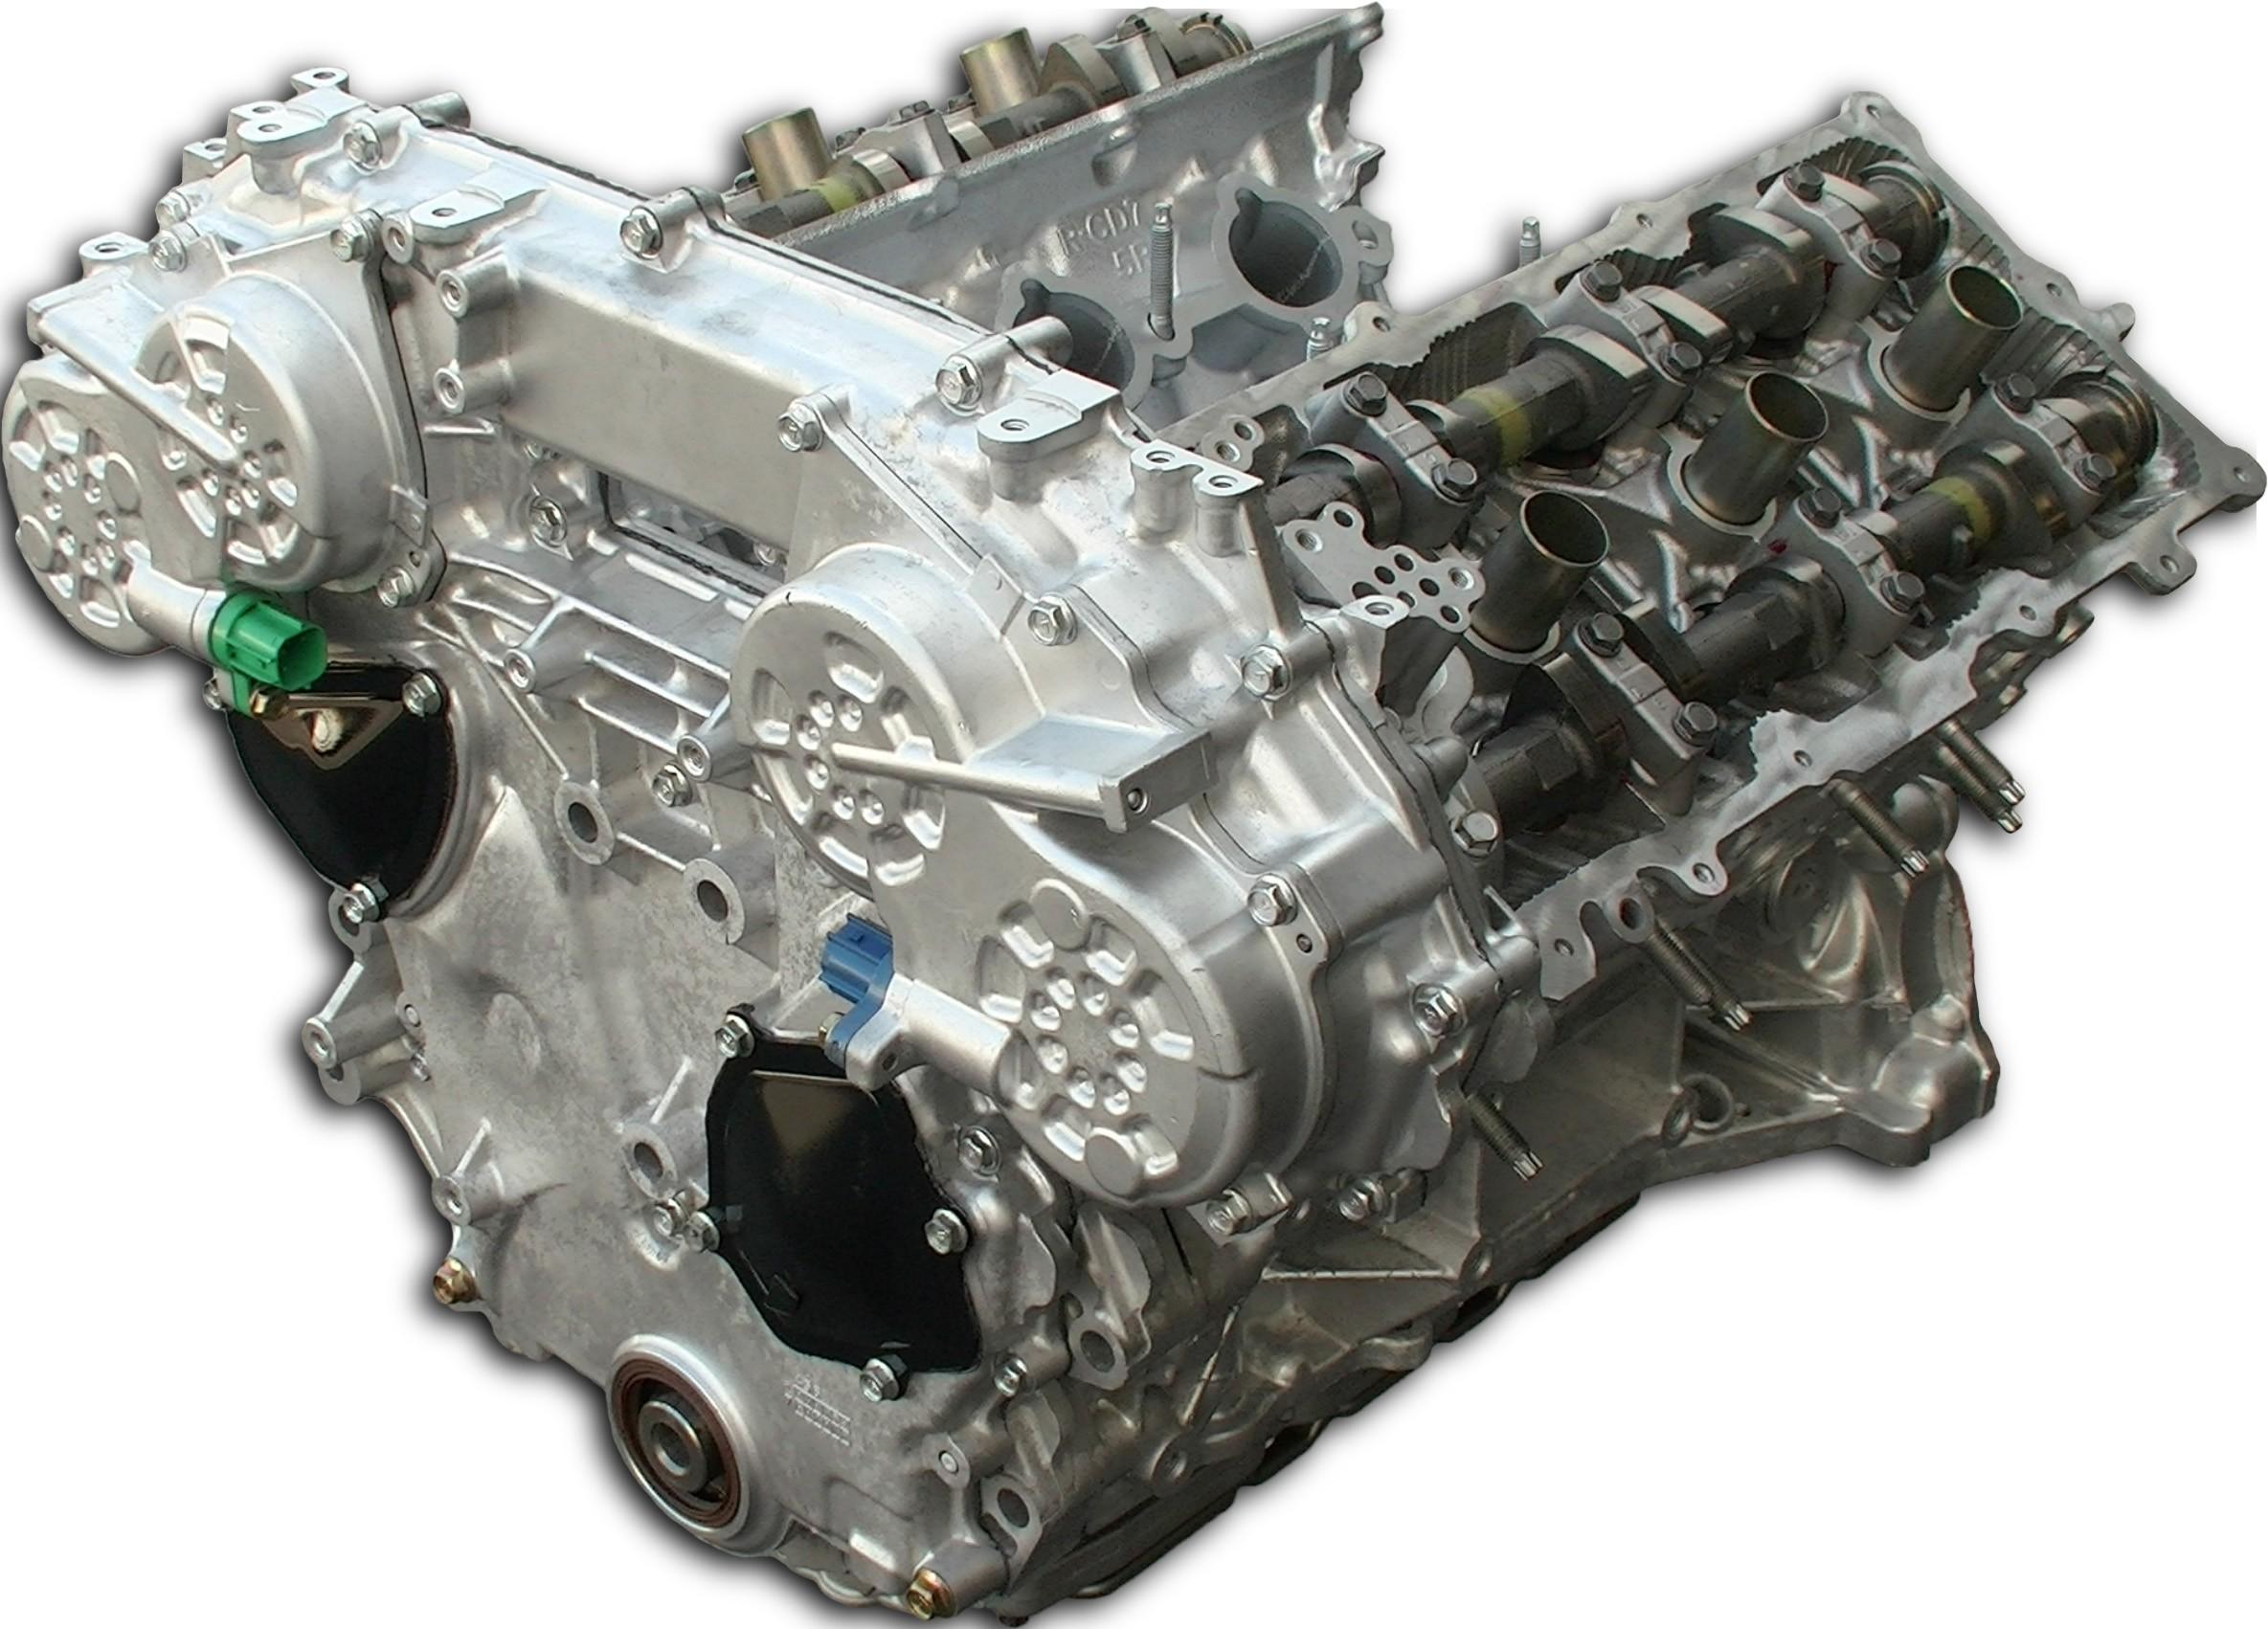 Rebuilt 05 07 Infinity G35 Coupe 3 5l Engine 171 Kar King Auto